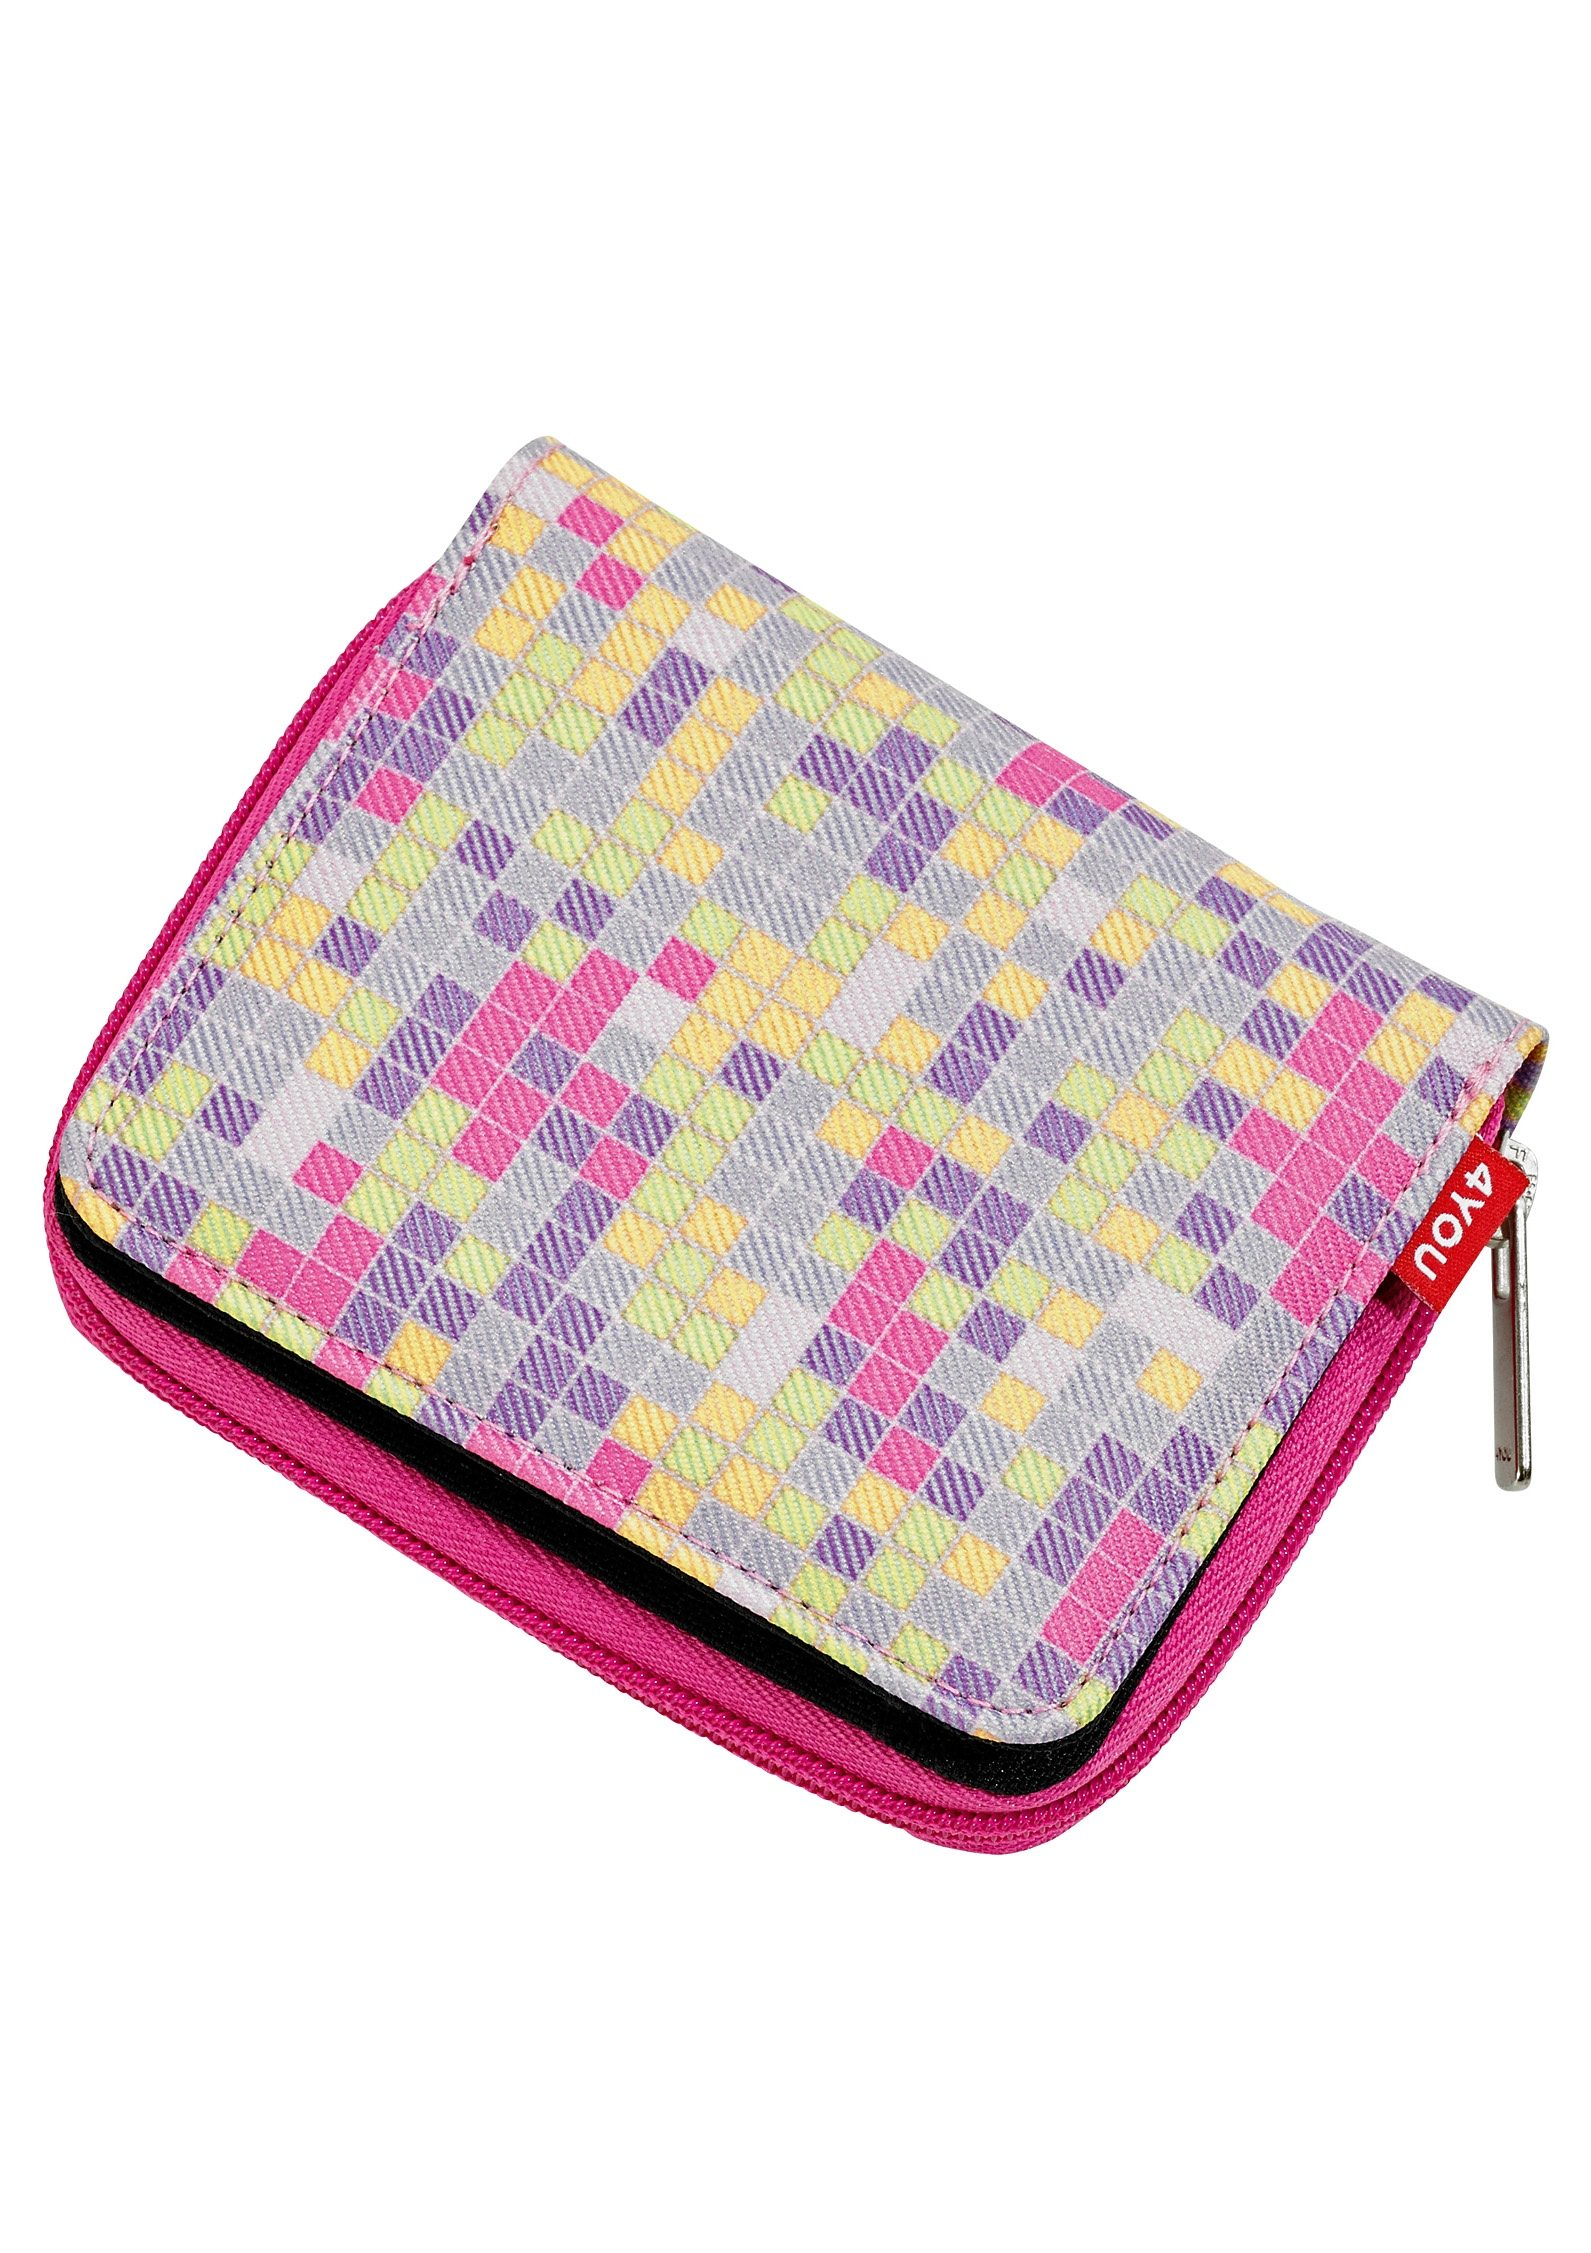 4YOU Geldbörse mit Reißverschluss, Pixel Sunset, »Zipper Wallet«